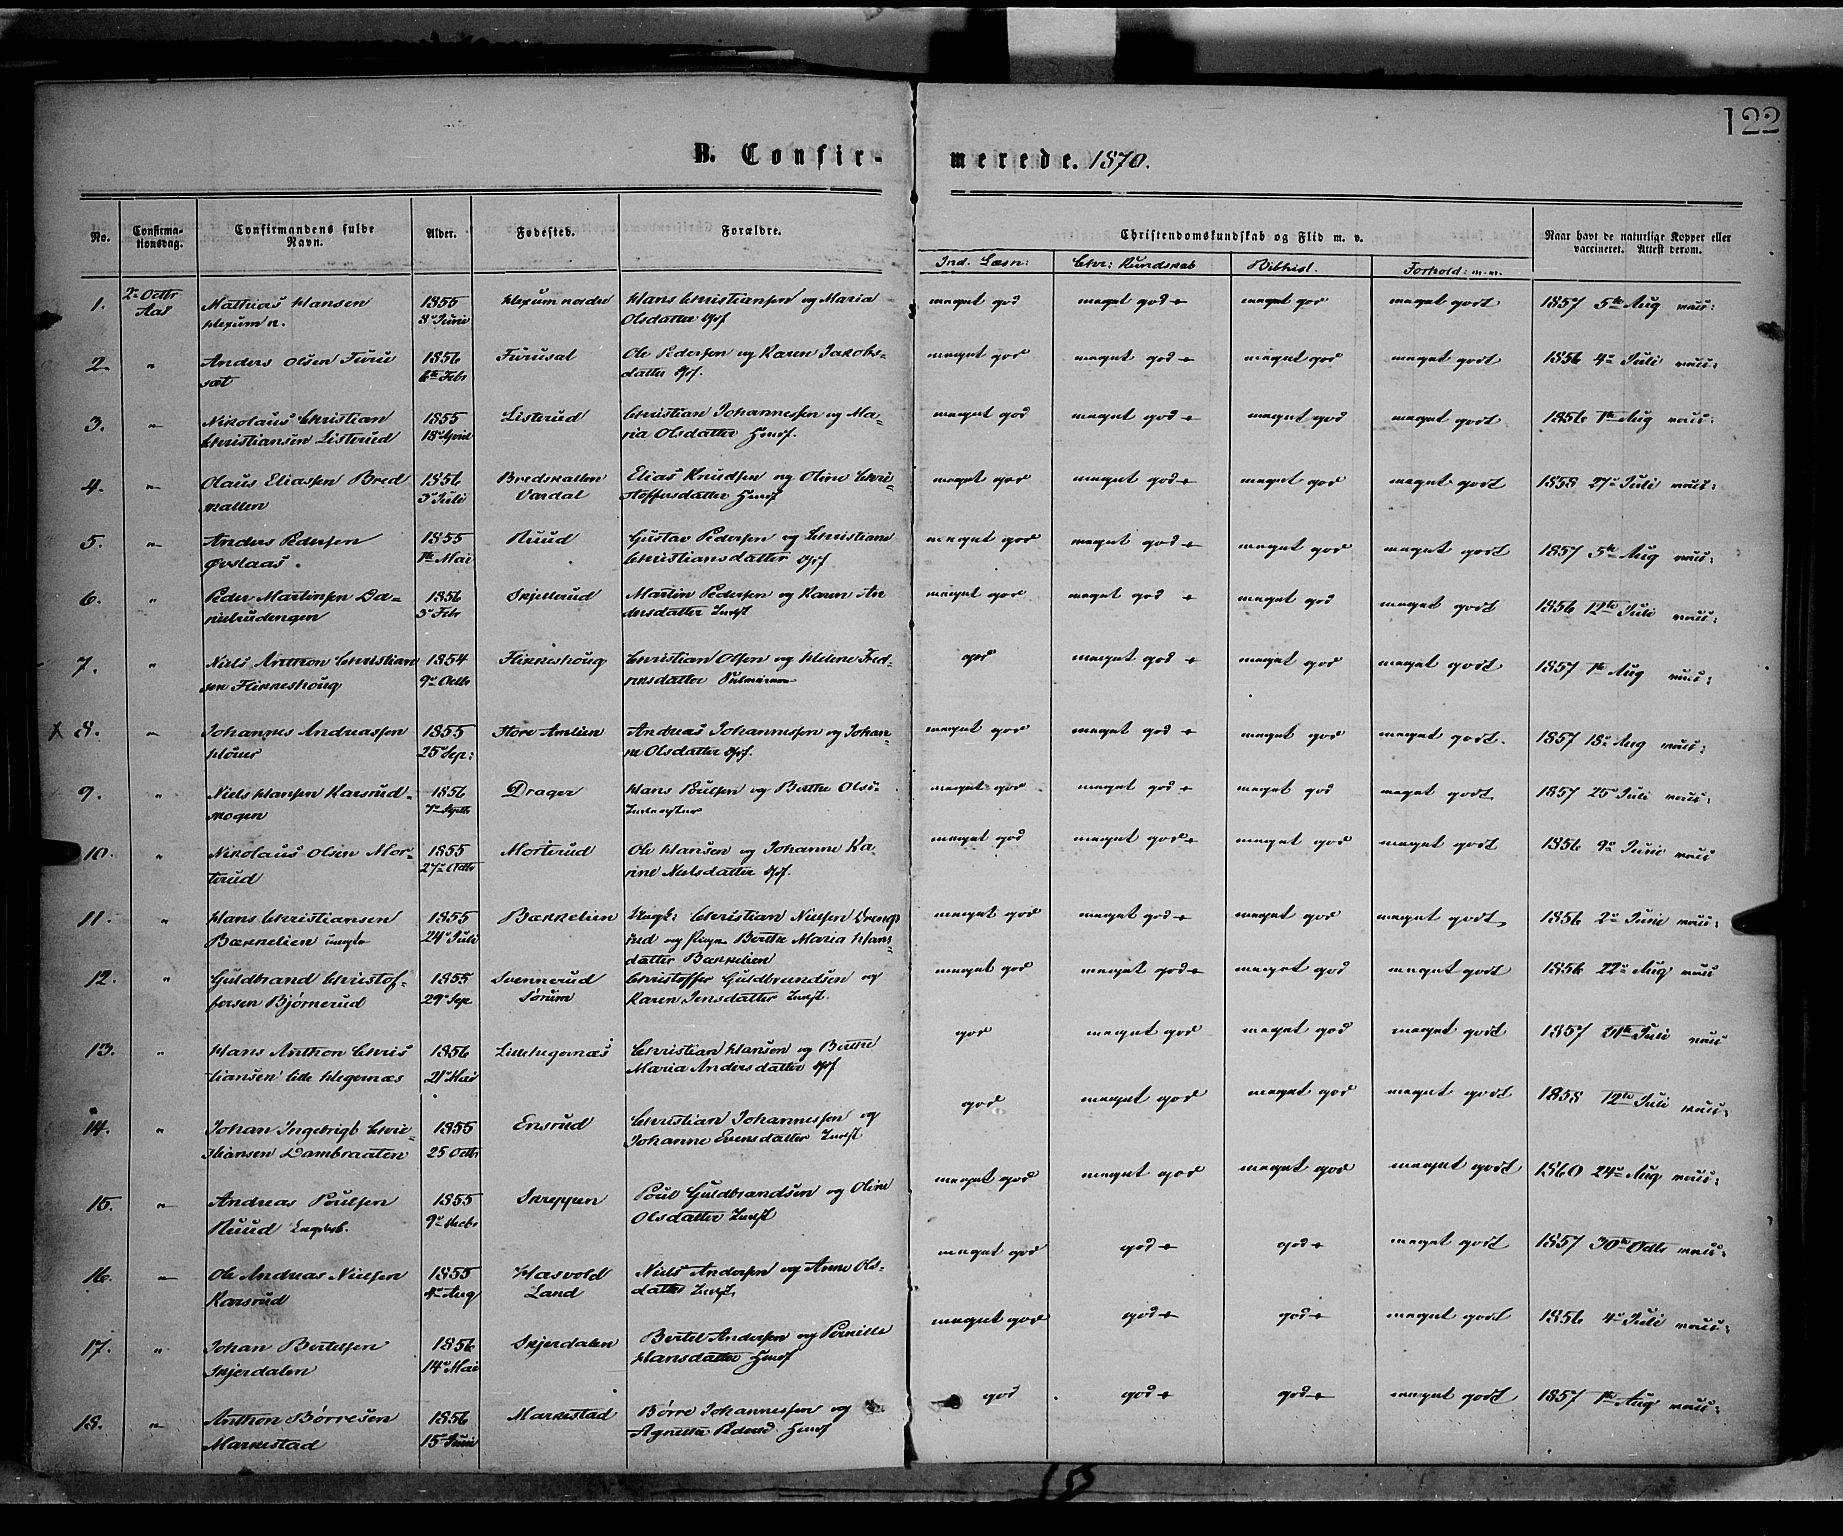 SAH, Vestre Toten prestekontor, H/Ha/Haa/L0008: Ministerialbok nr. 8, 1870-1877, s. 122